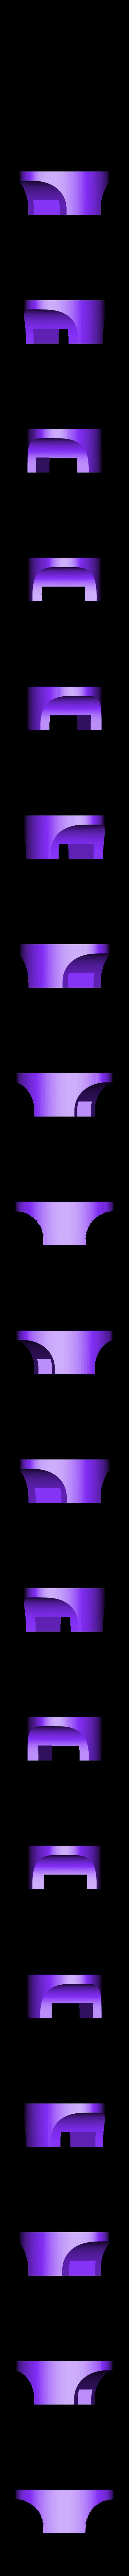 Support radiateur douche suppérieur.STL Download STL file Shower radiator holder • 3D printable design, Jorony